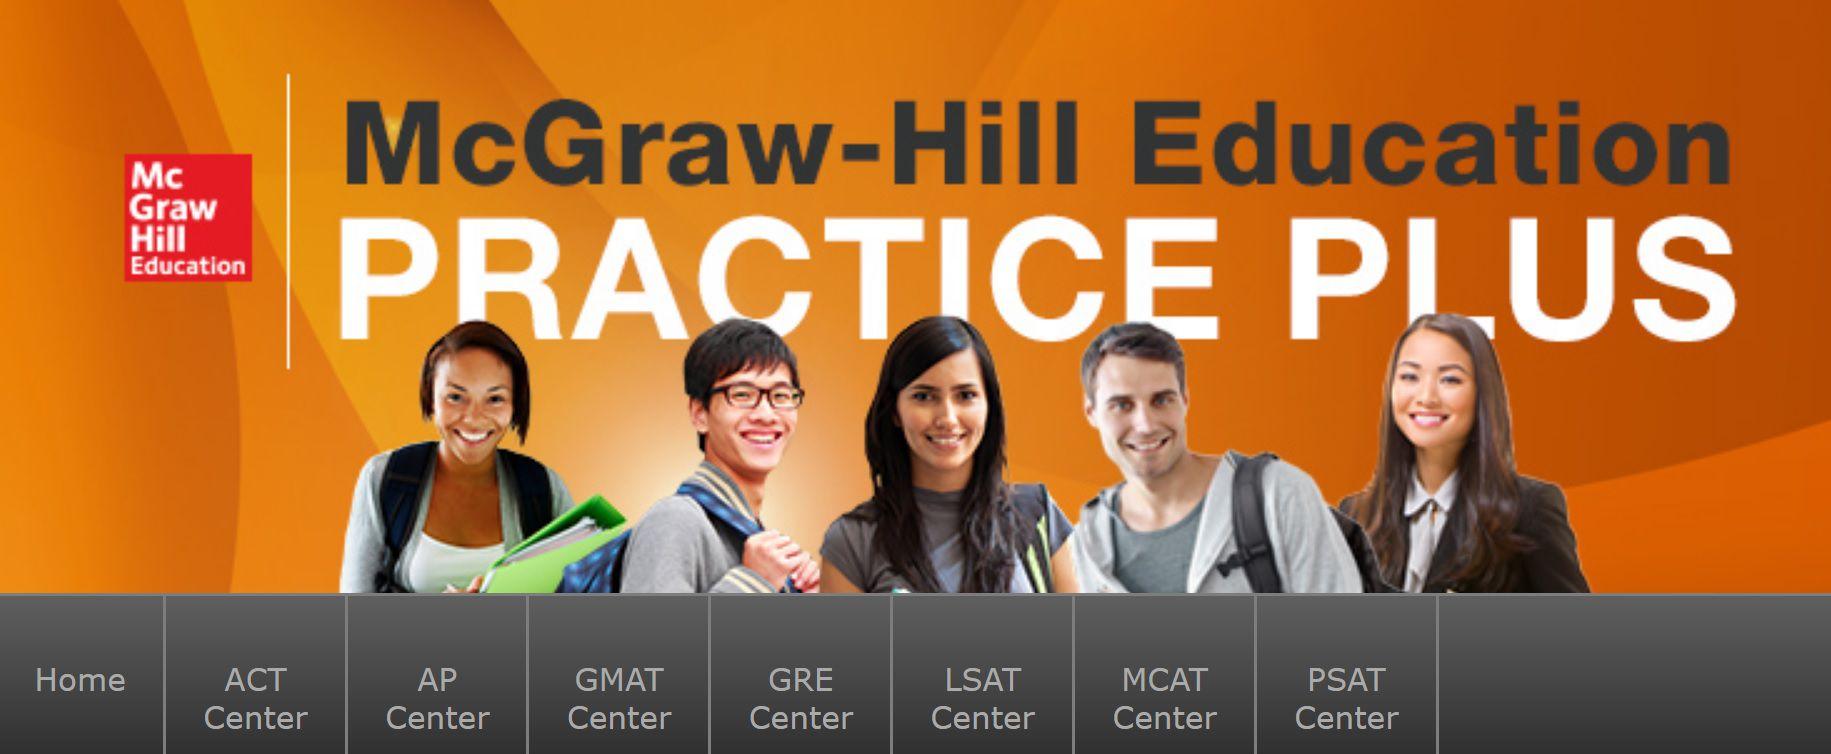 McGraw-Hill Education Practice Plus Screen Grab